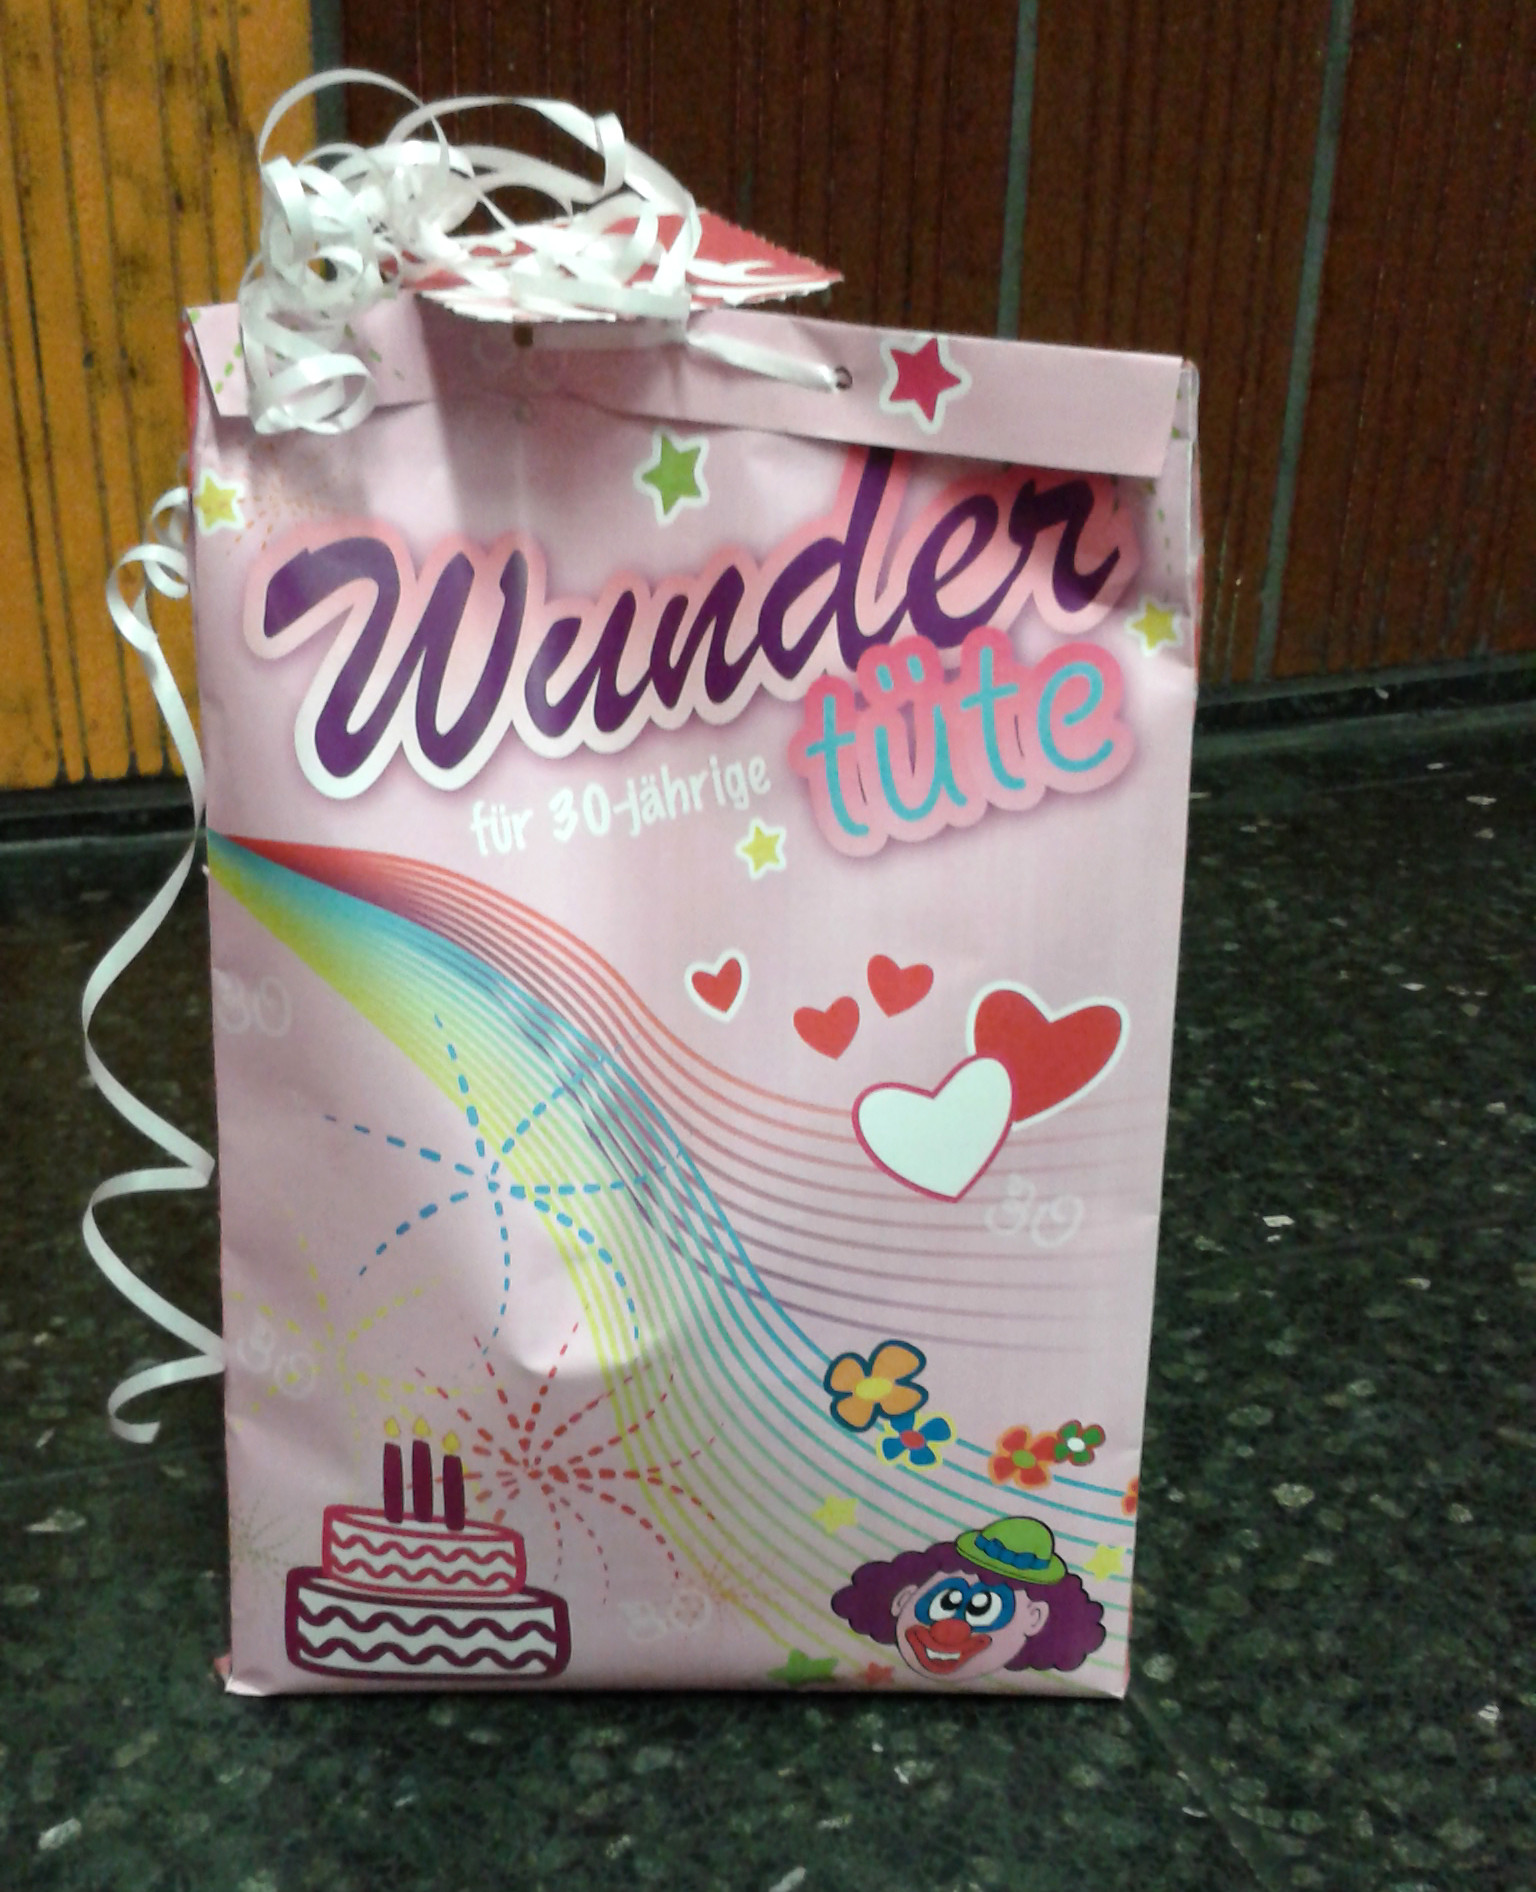 Geburtstagsgeschenk Oma Diy  Geburtstagsgeschenk DIY Wundertüte – huemelswelt